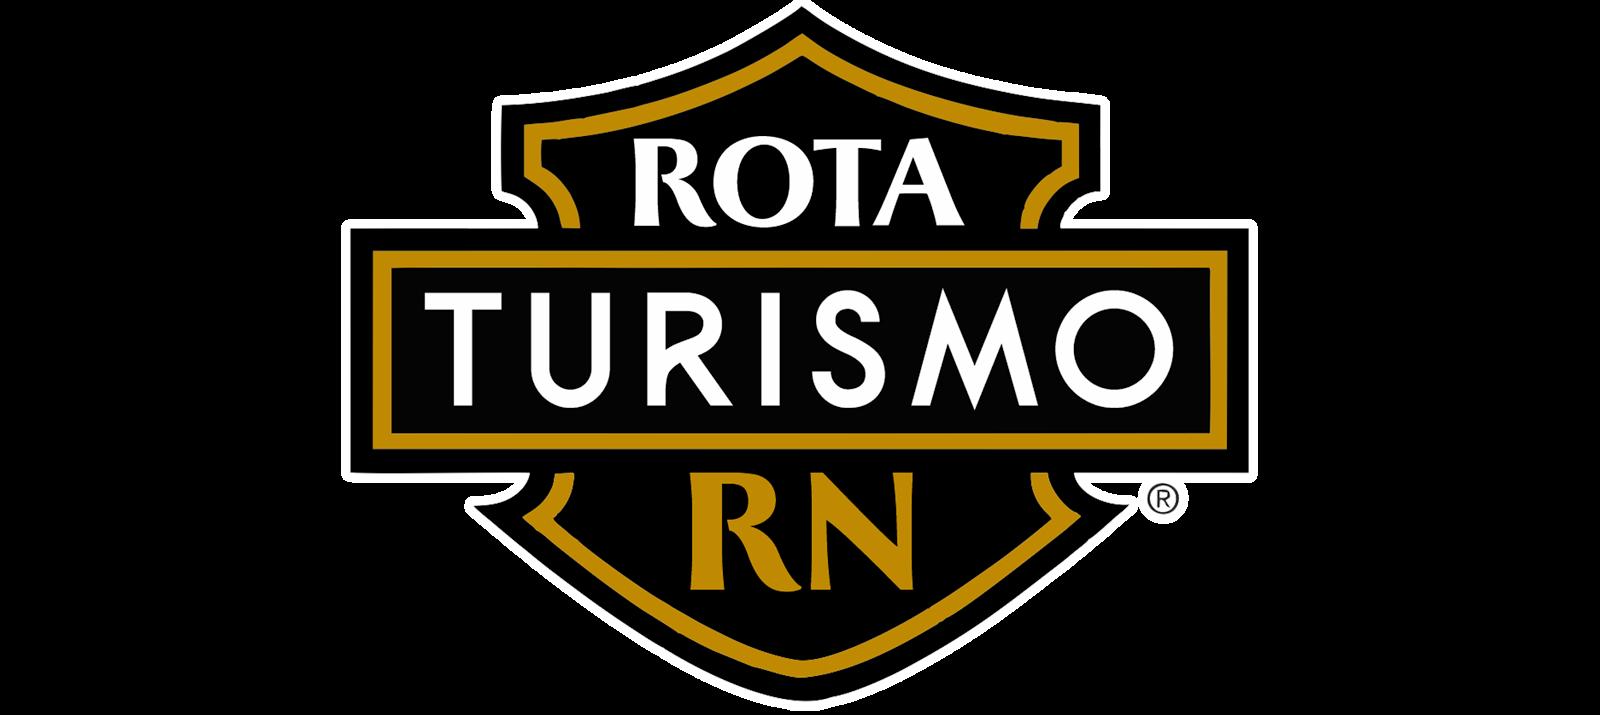 Rota Turismo RN